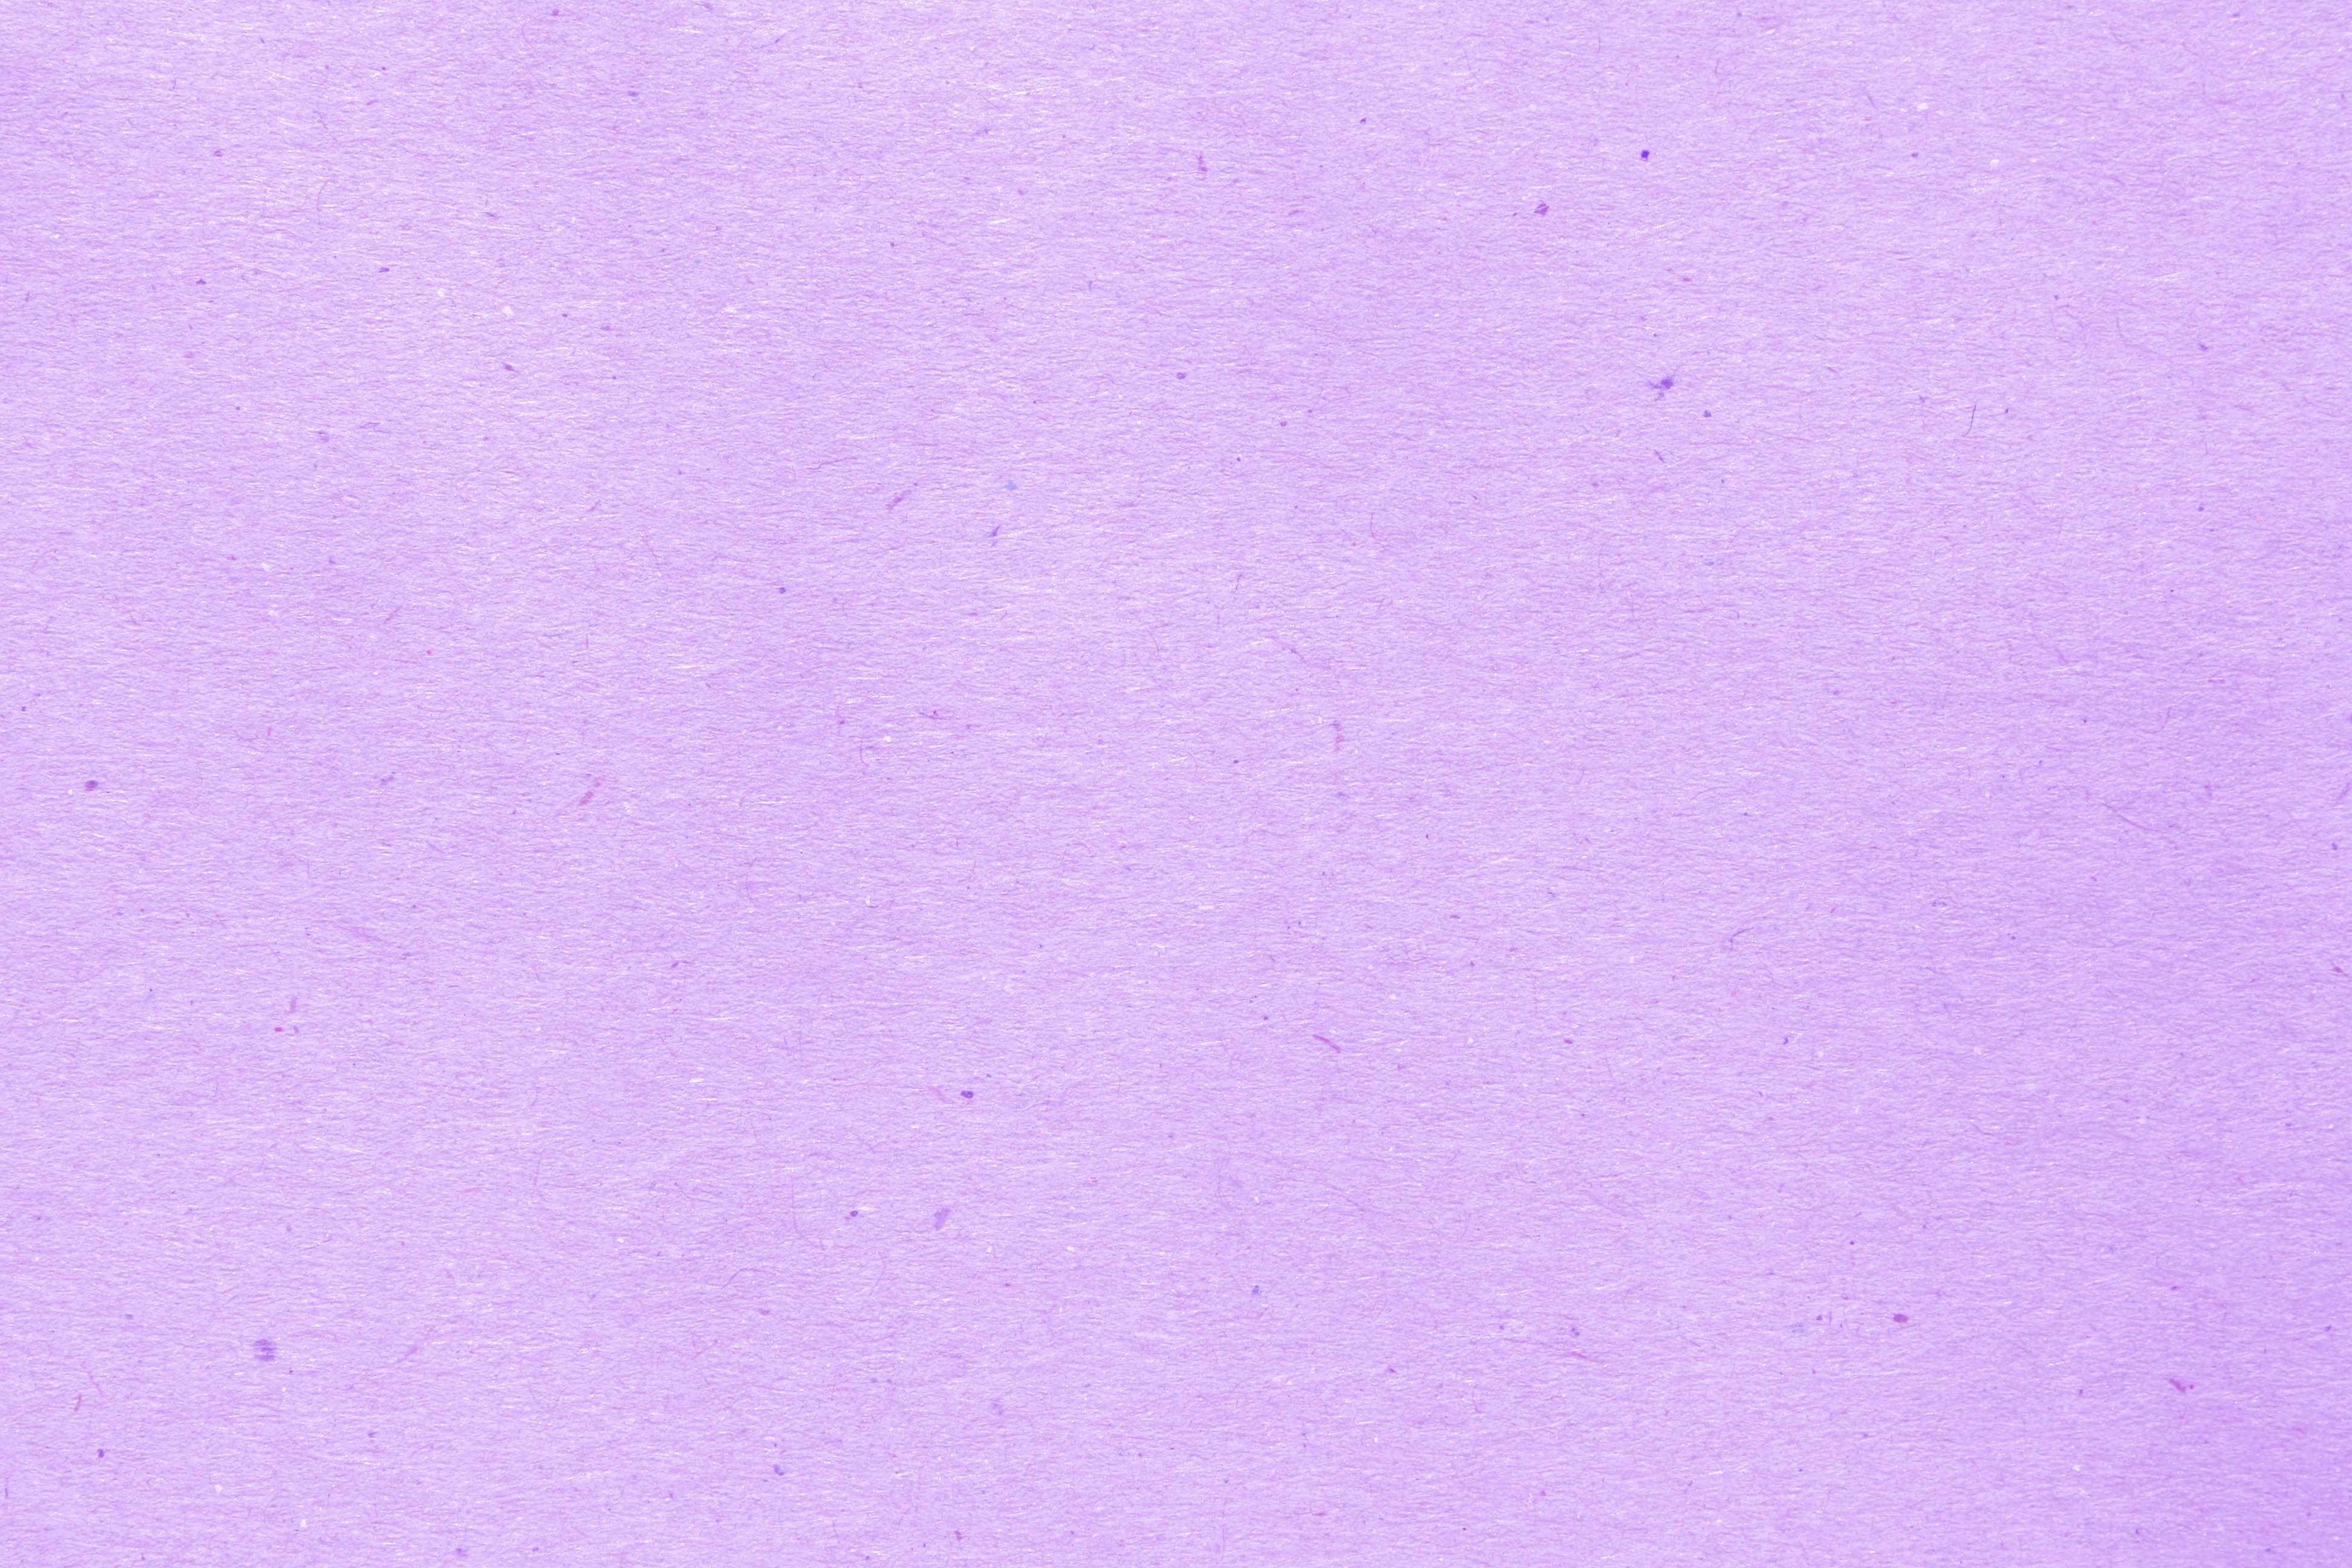 Light Purple 11 Light Purple Background Photo Texture Purple Backgrounds